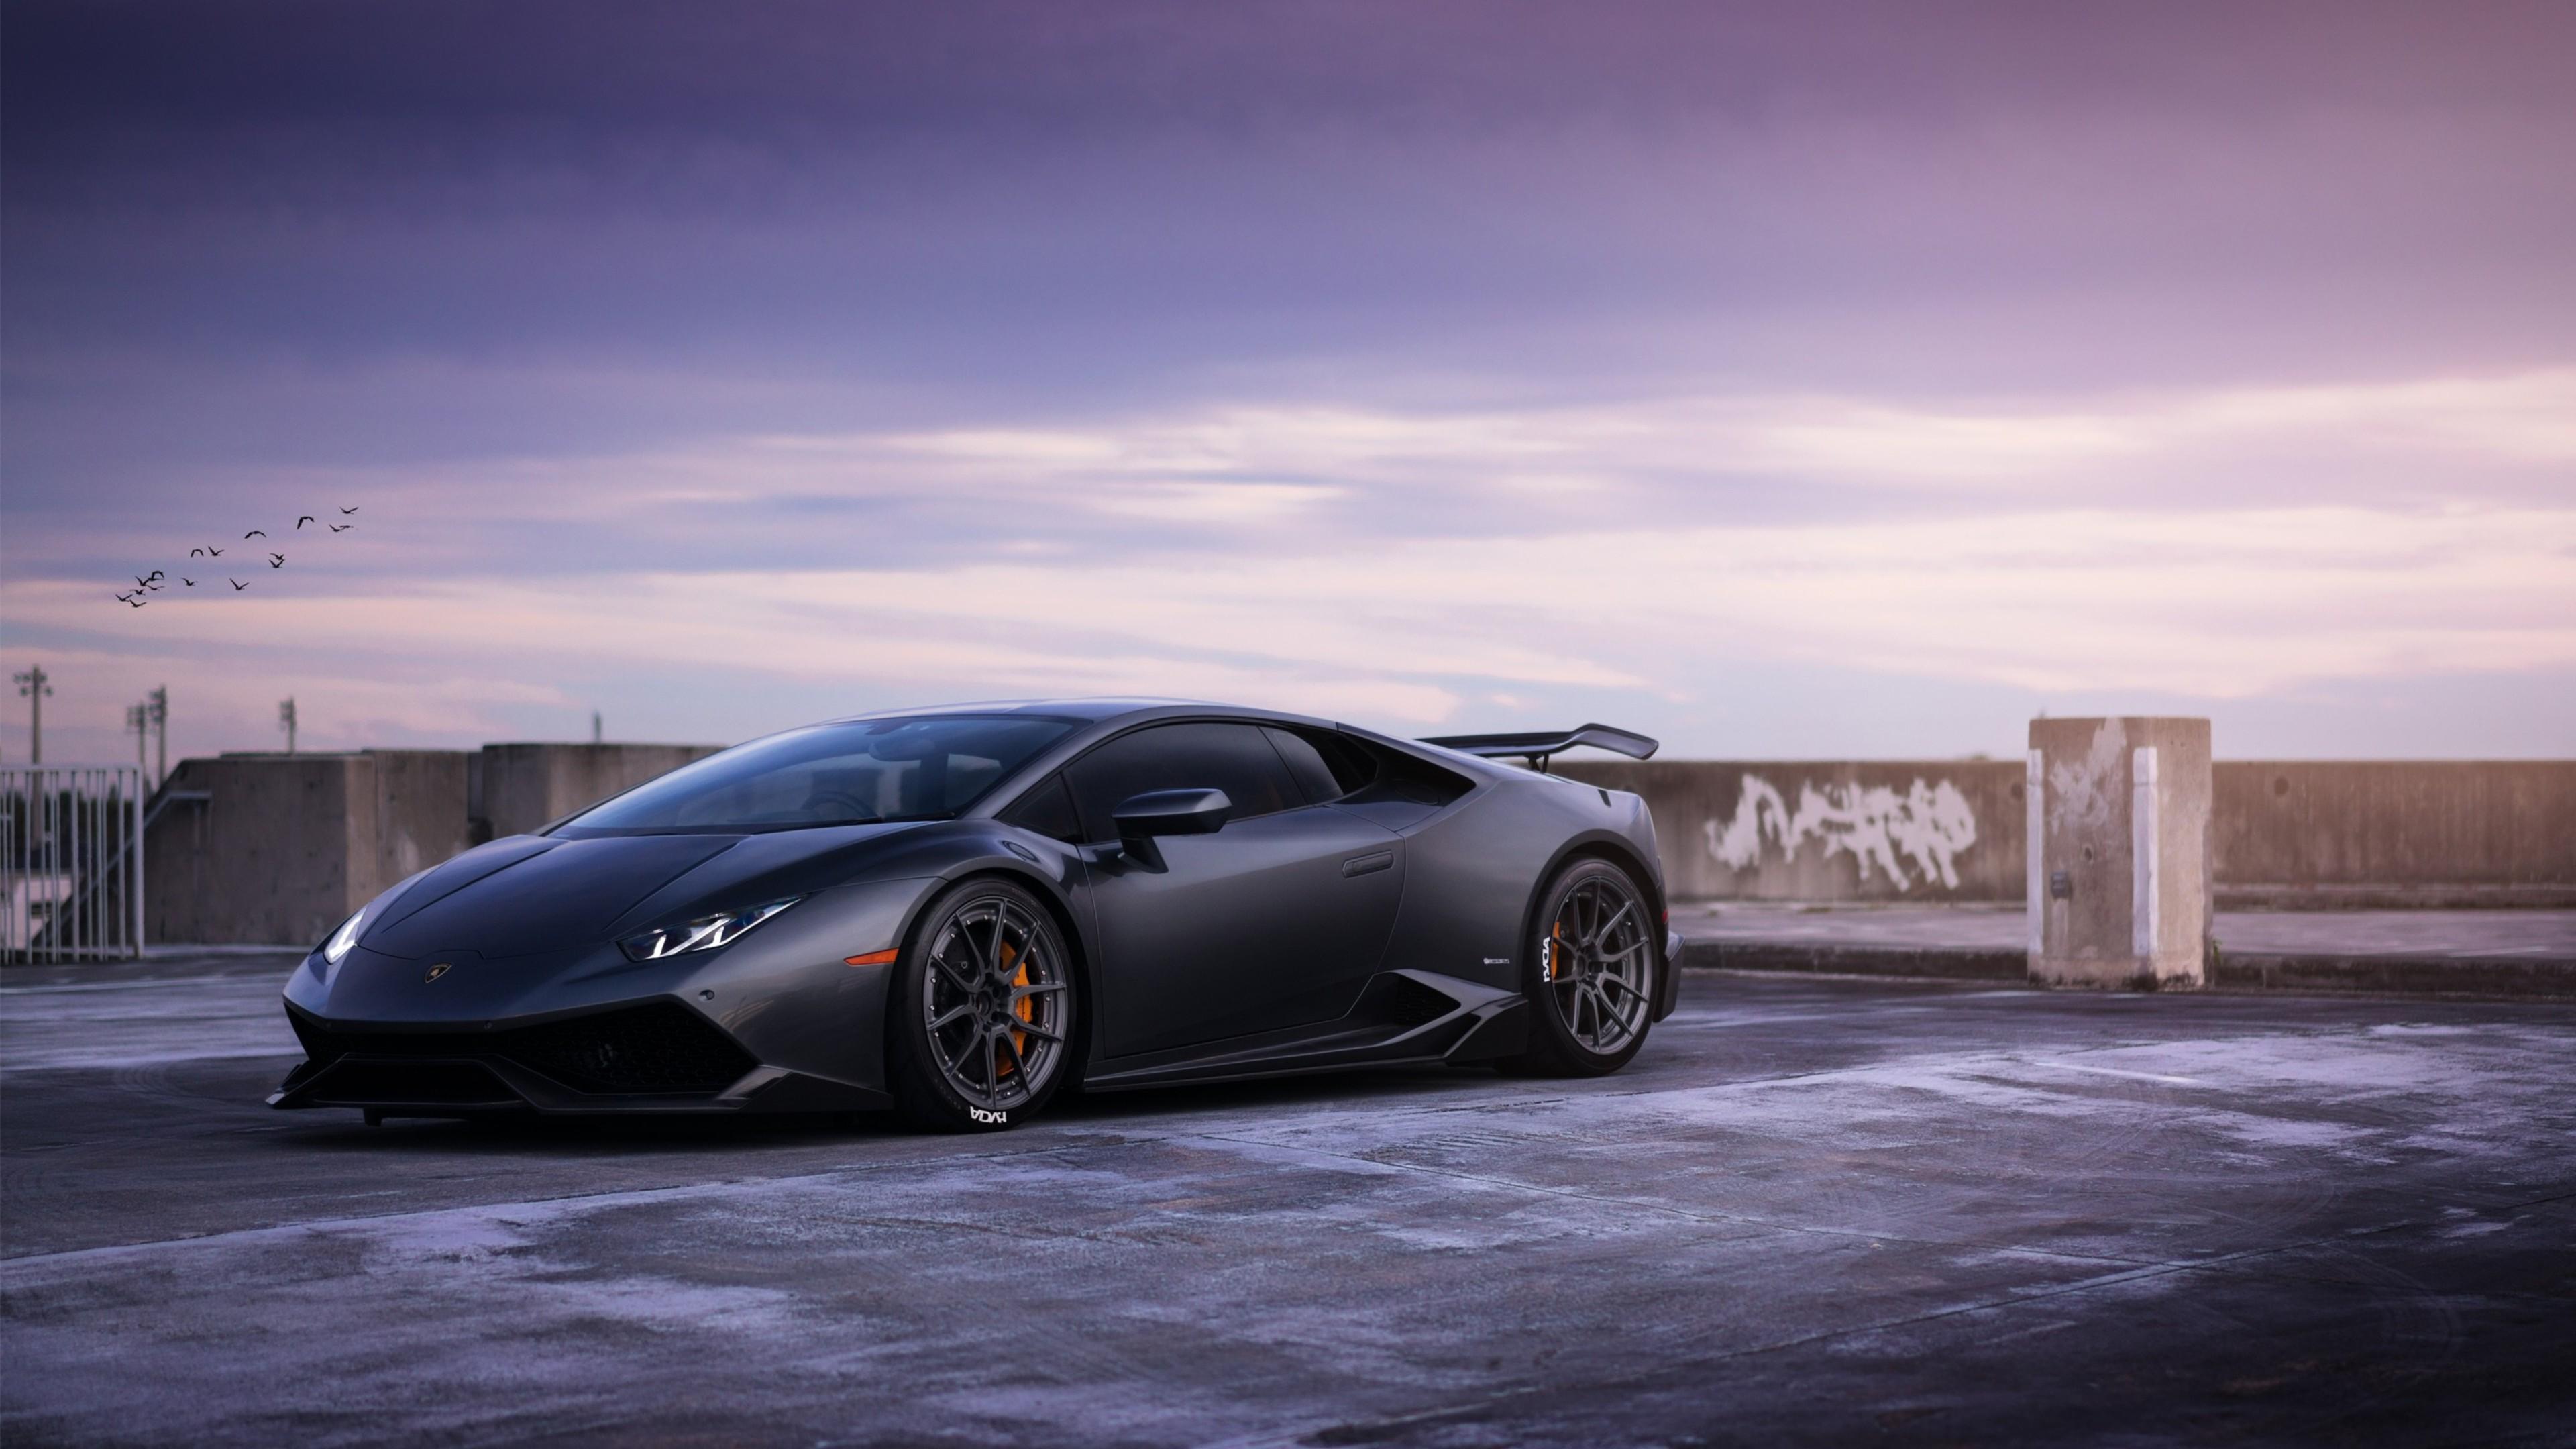 Adv Wheels Lamborghini Huracan Hd Cars 4k Wallpapers Images